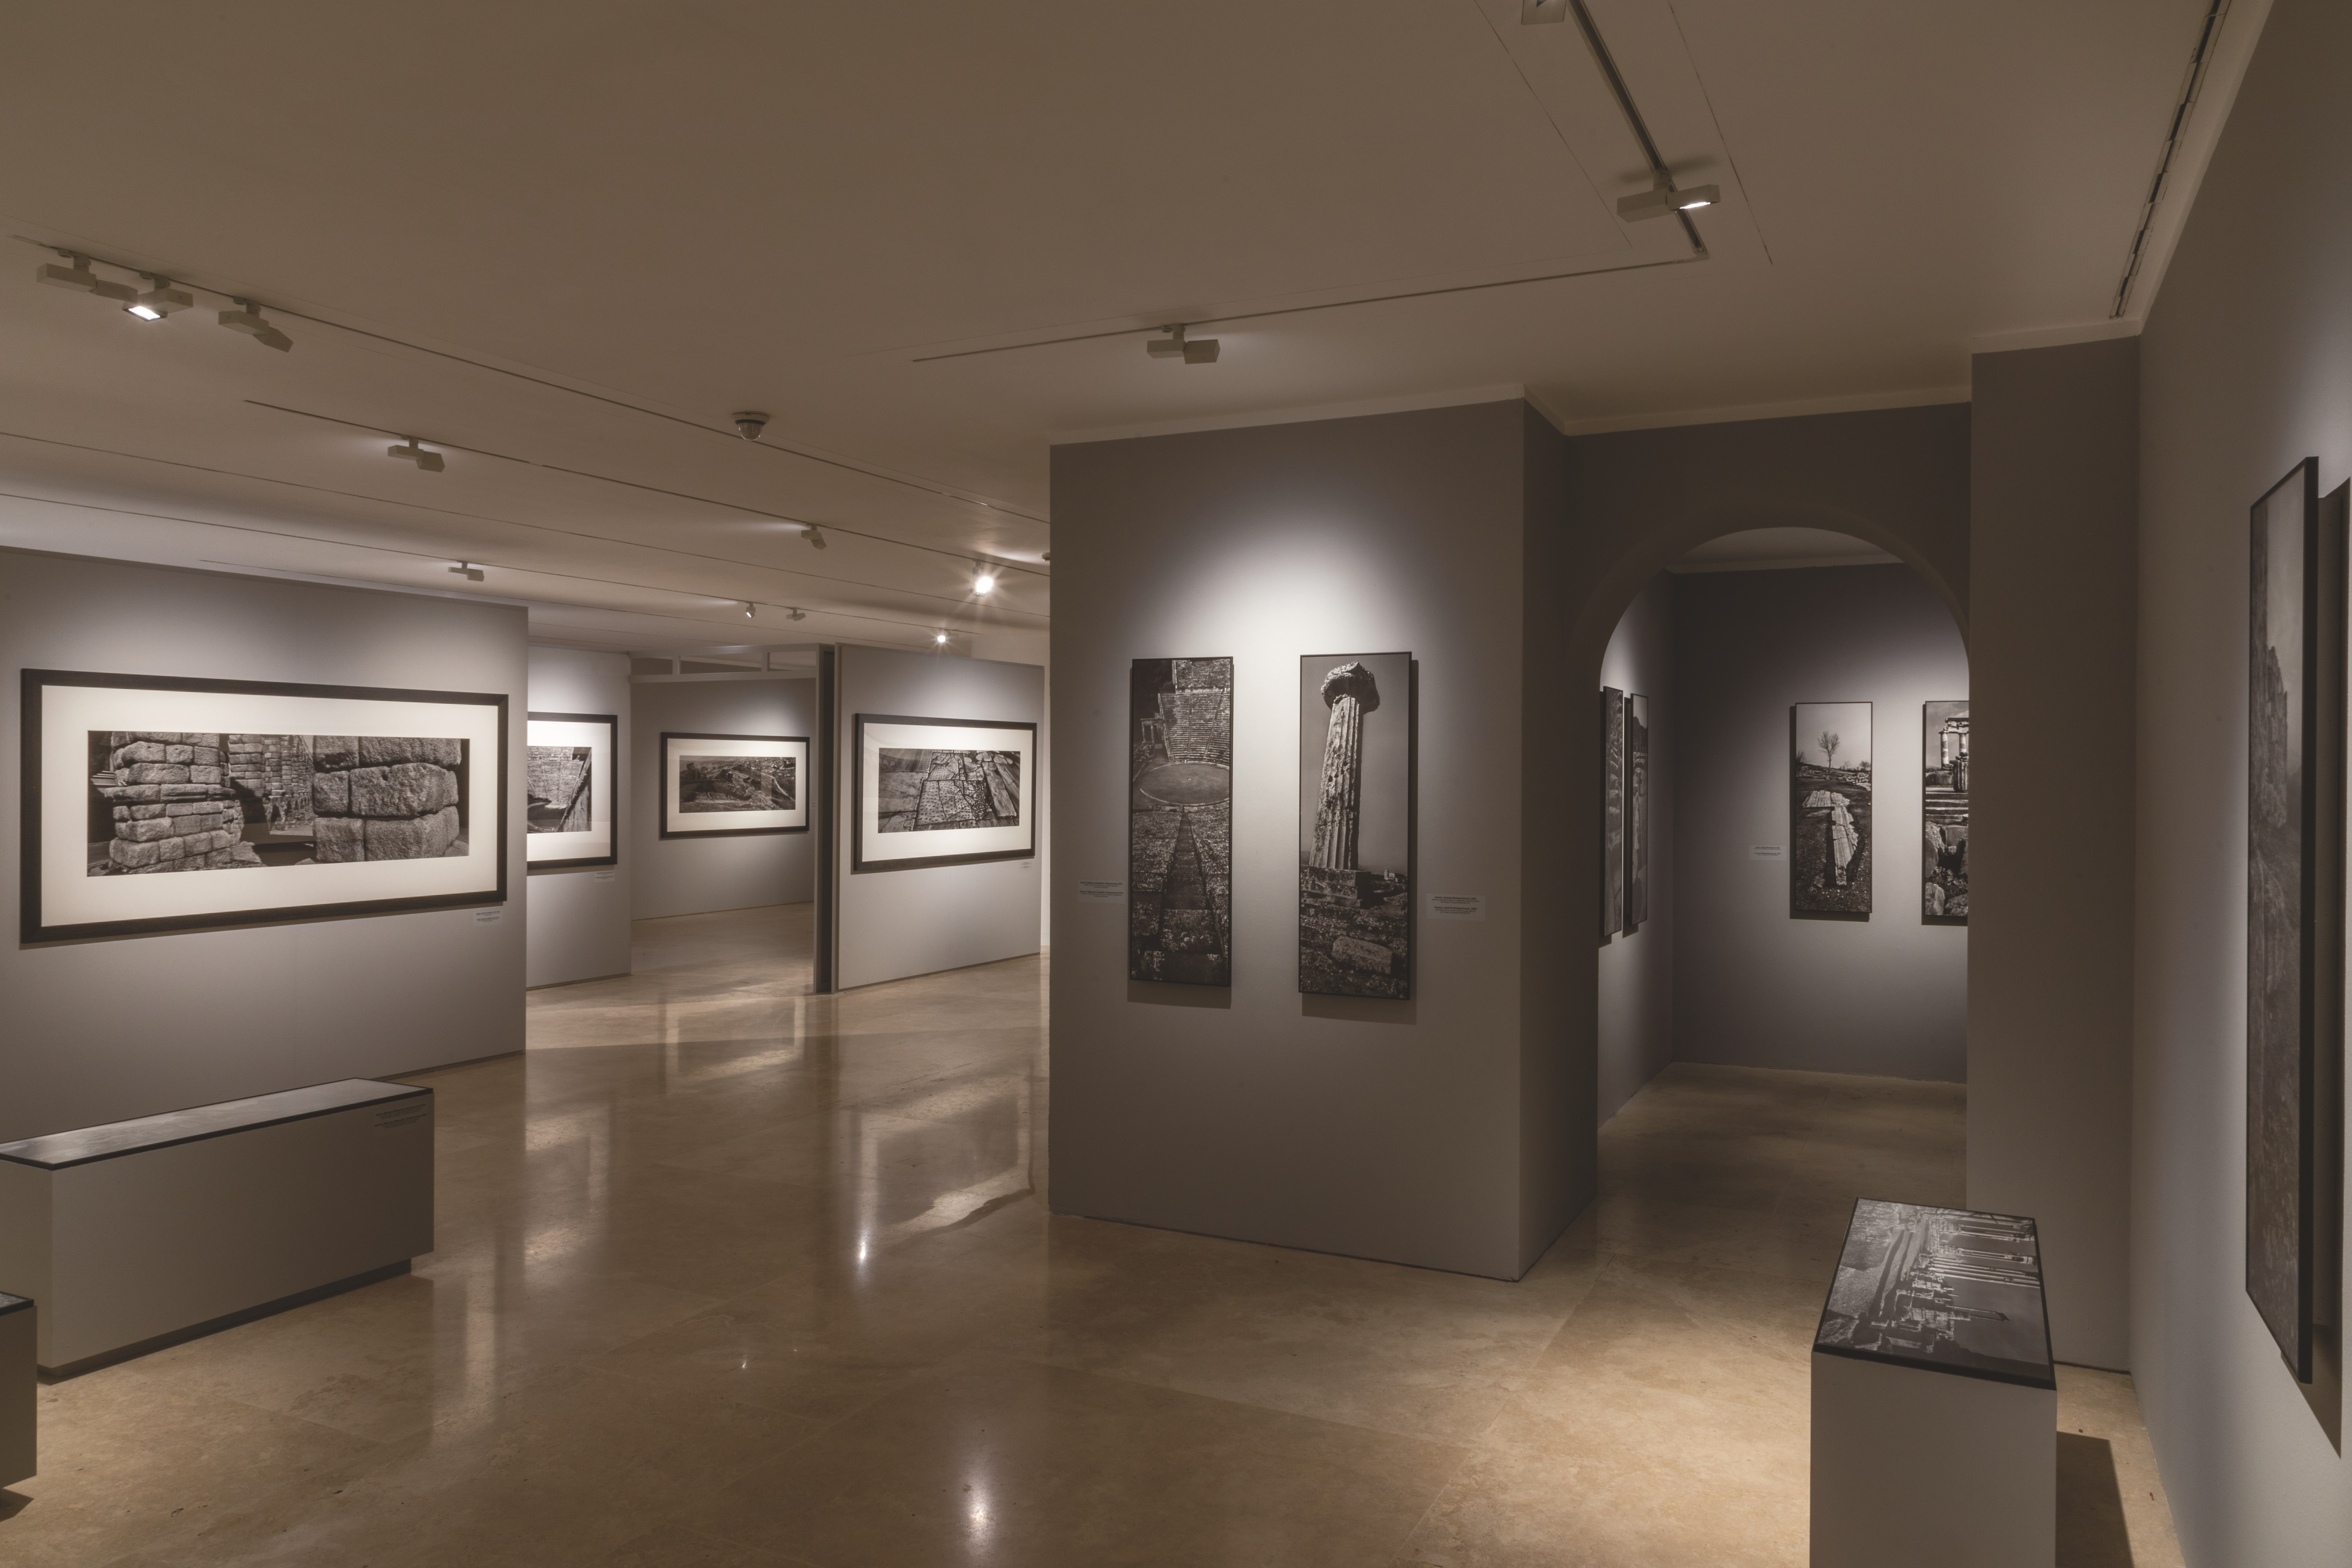 JOSEF KOUDELKA.RADICI_Museo dell'Ara Pacis @ Sovrintendenza Capitolina ai Beni Culturali